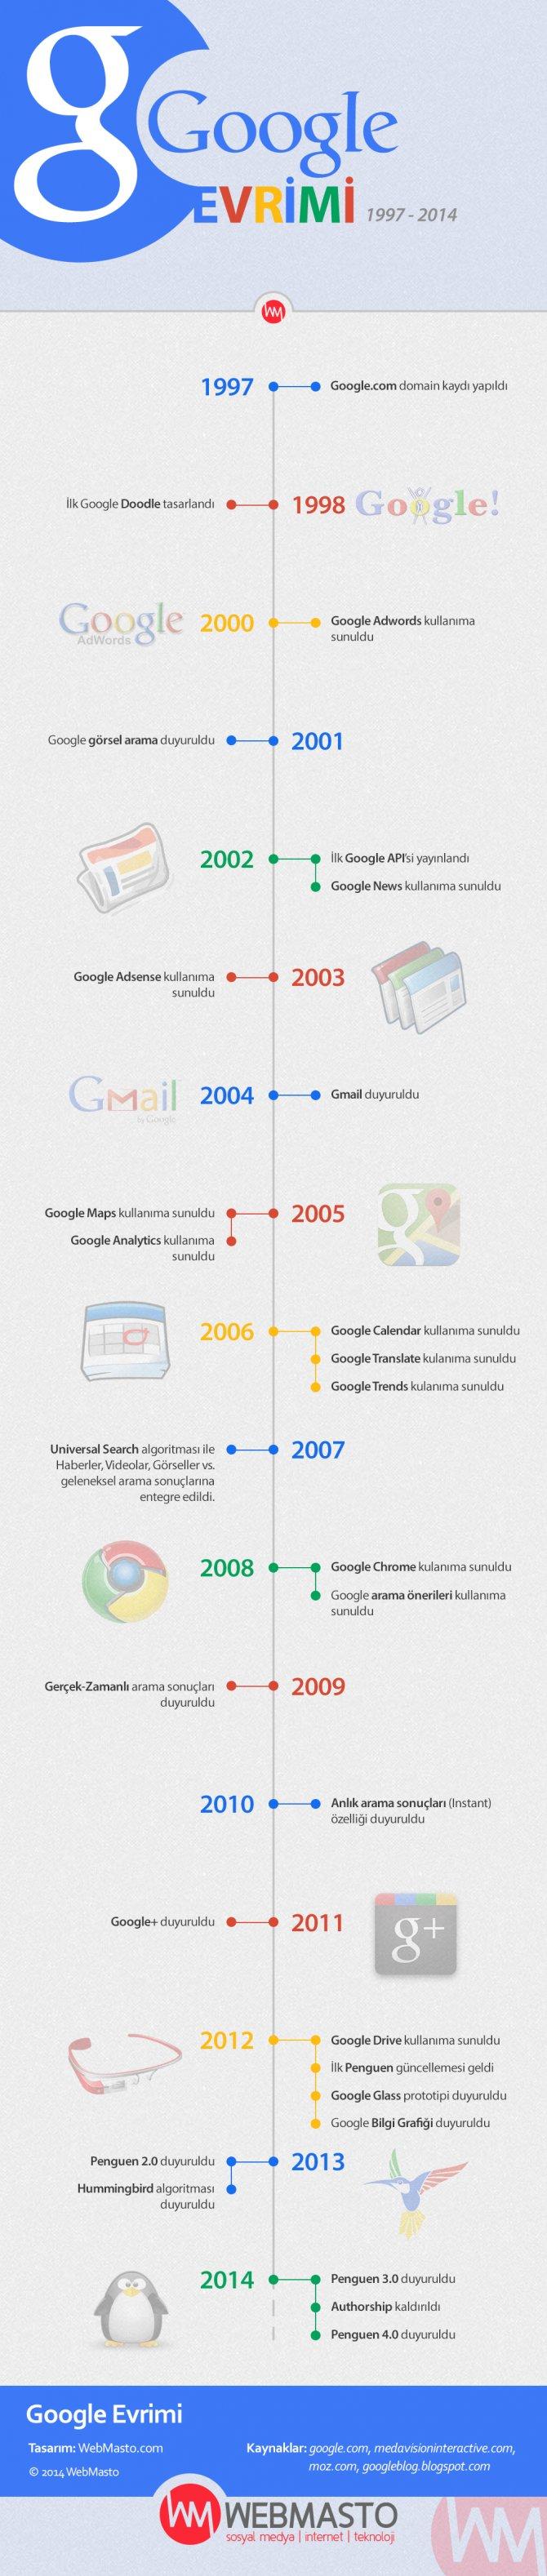 google-evrimi-webmasto-infografik.jpg